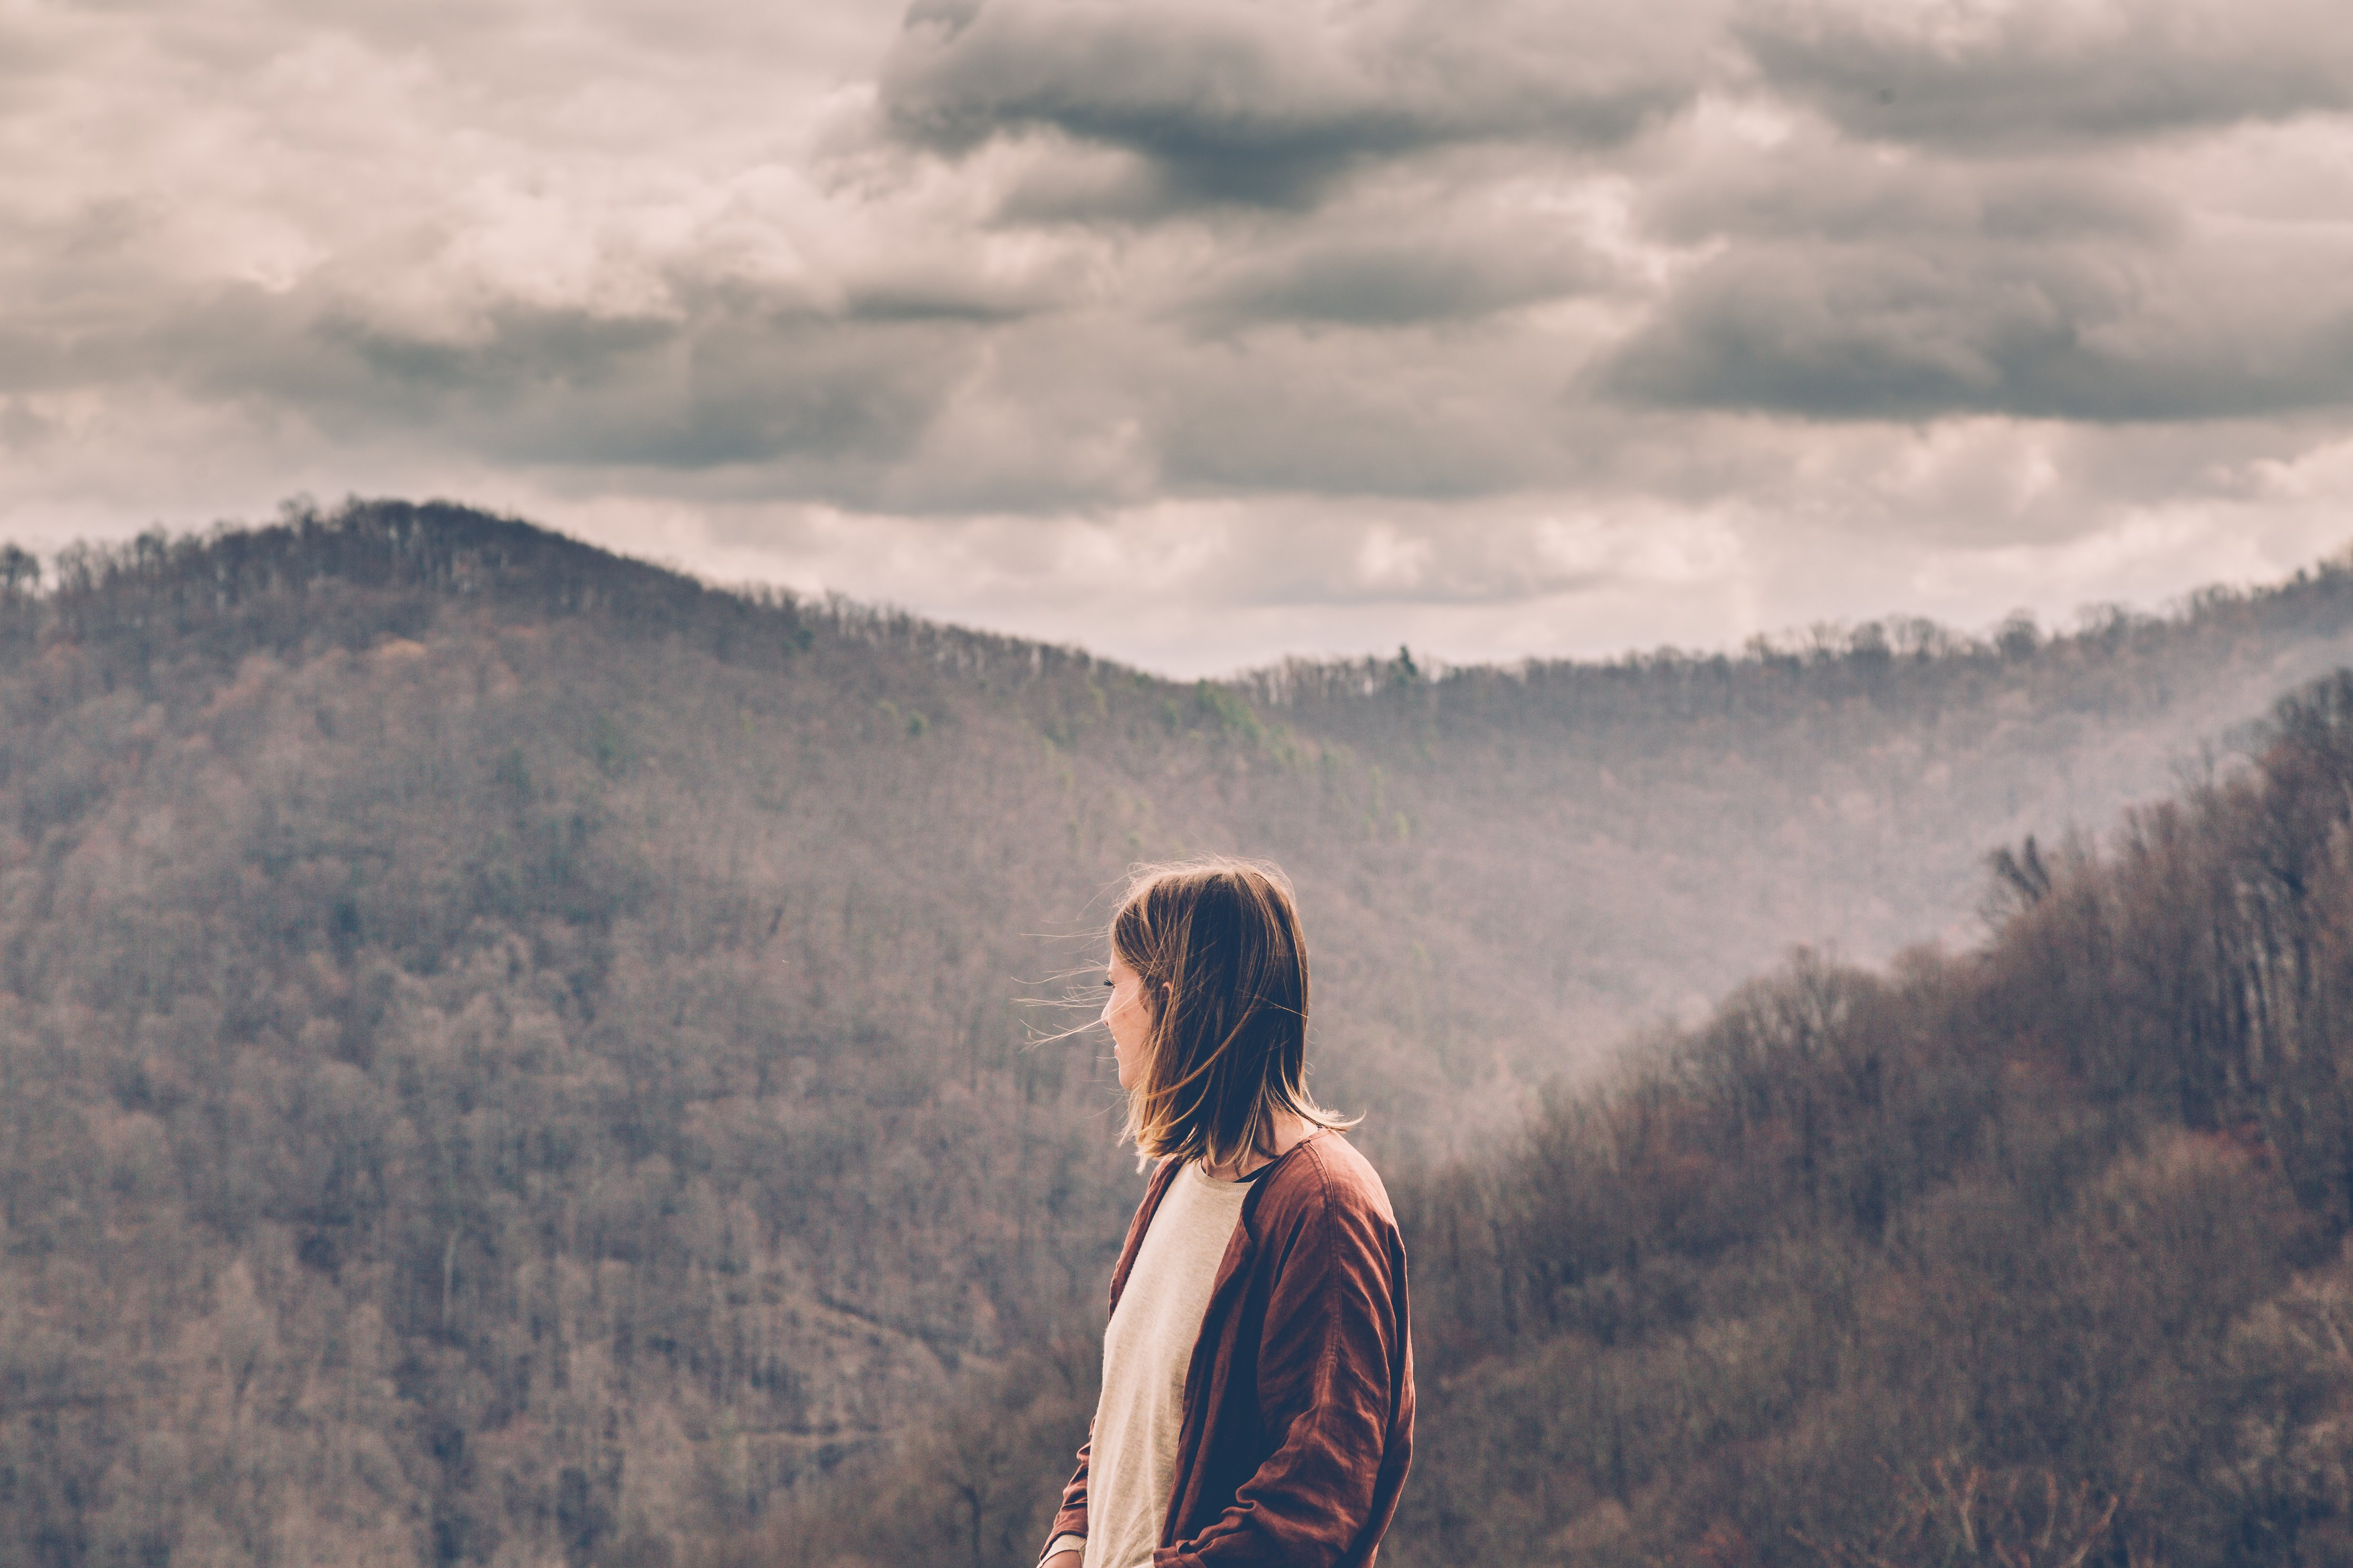 woman-wanderer_4460x4460